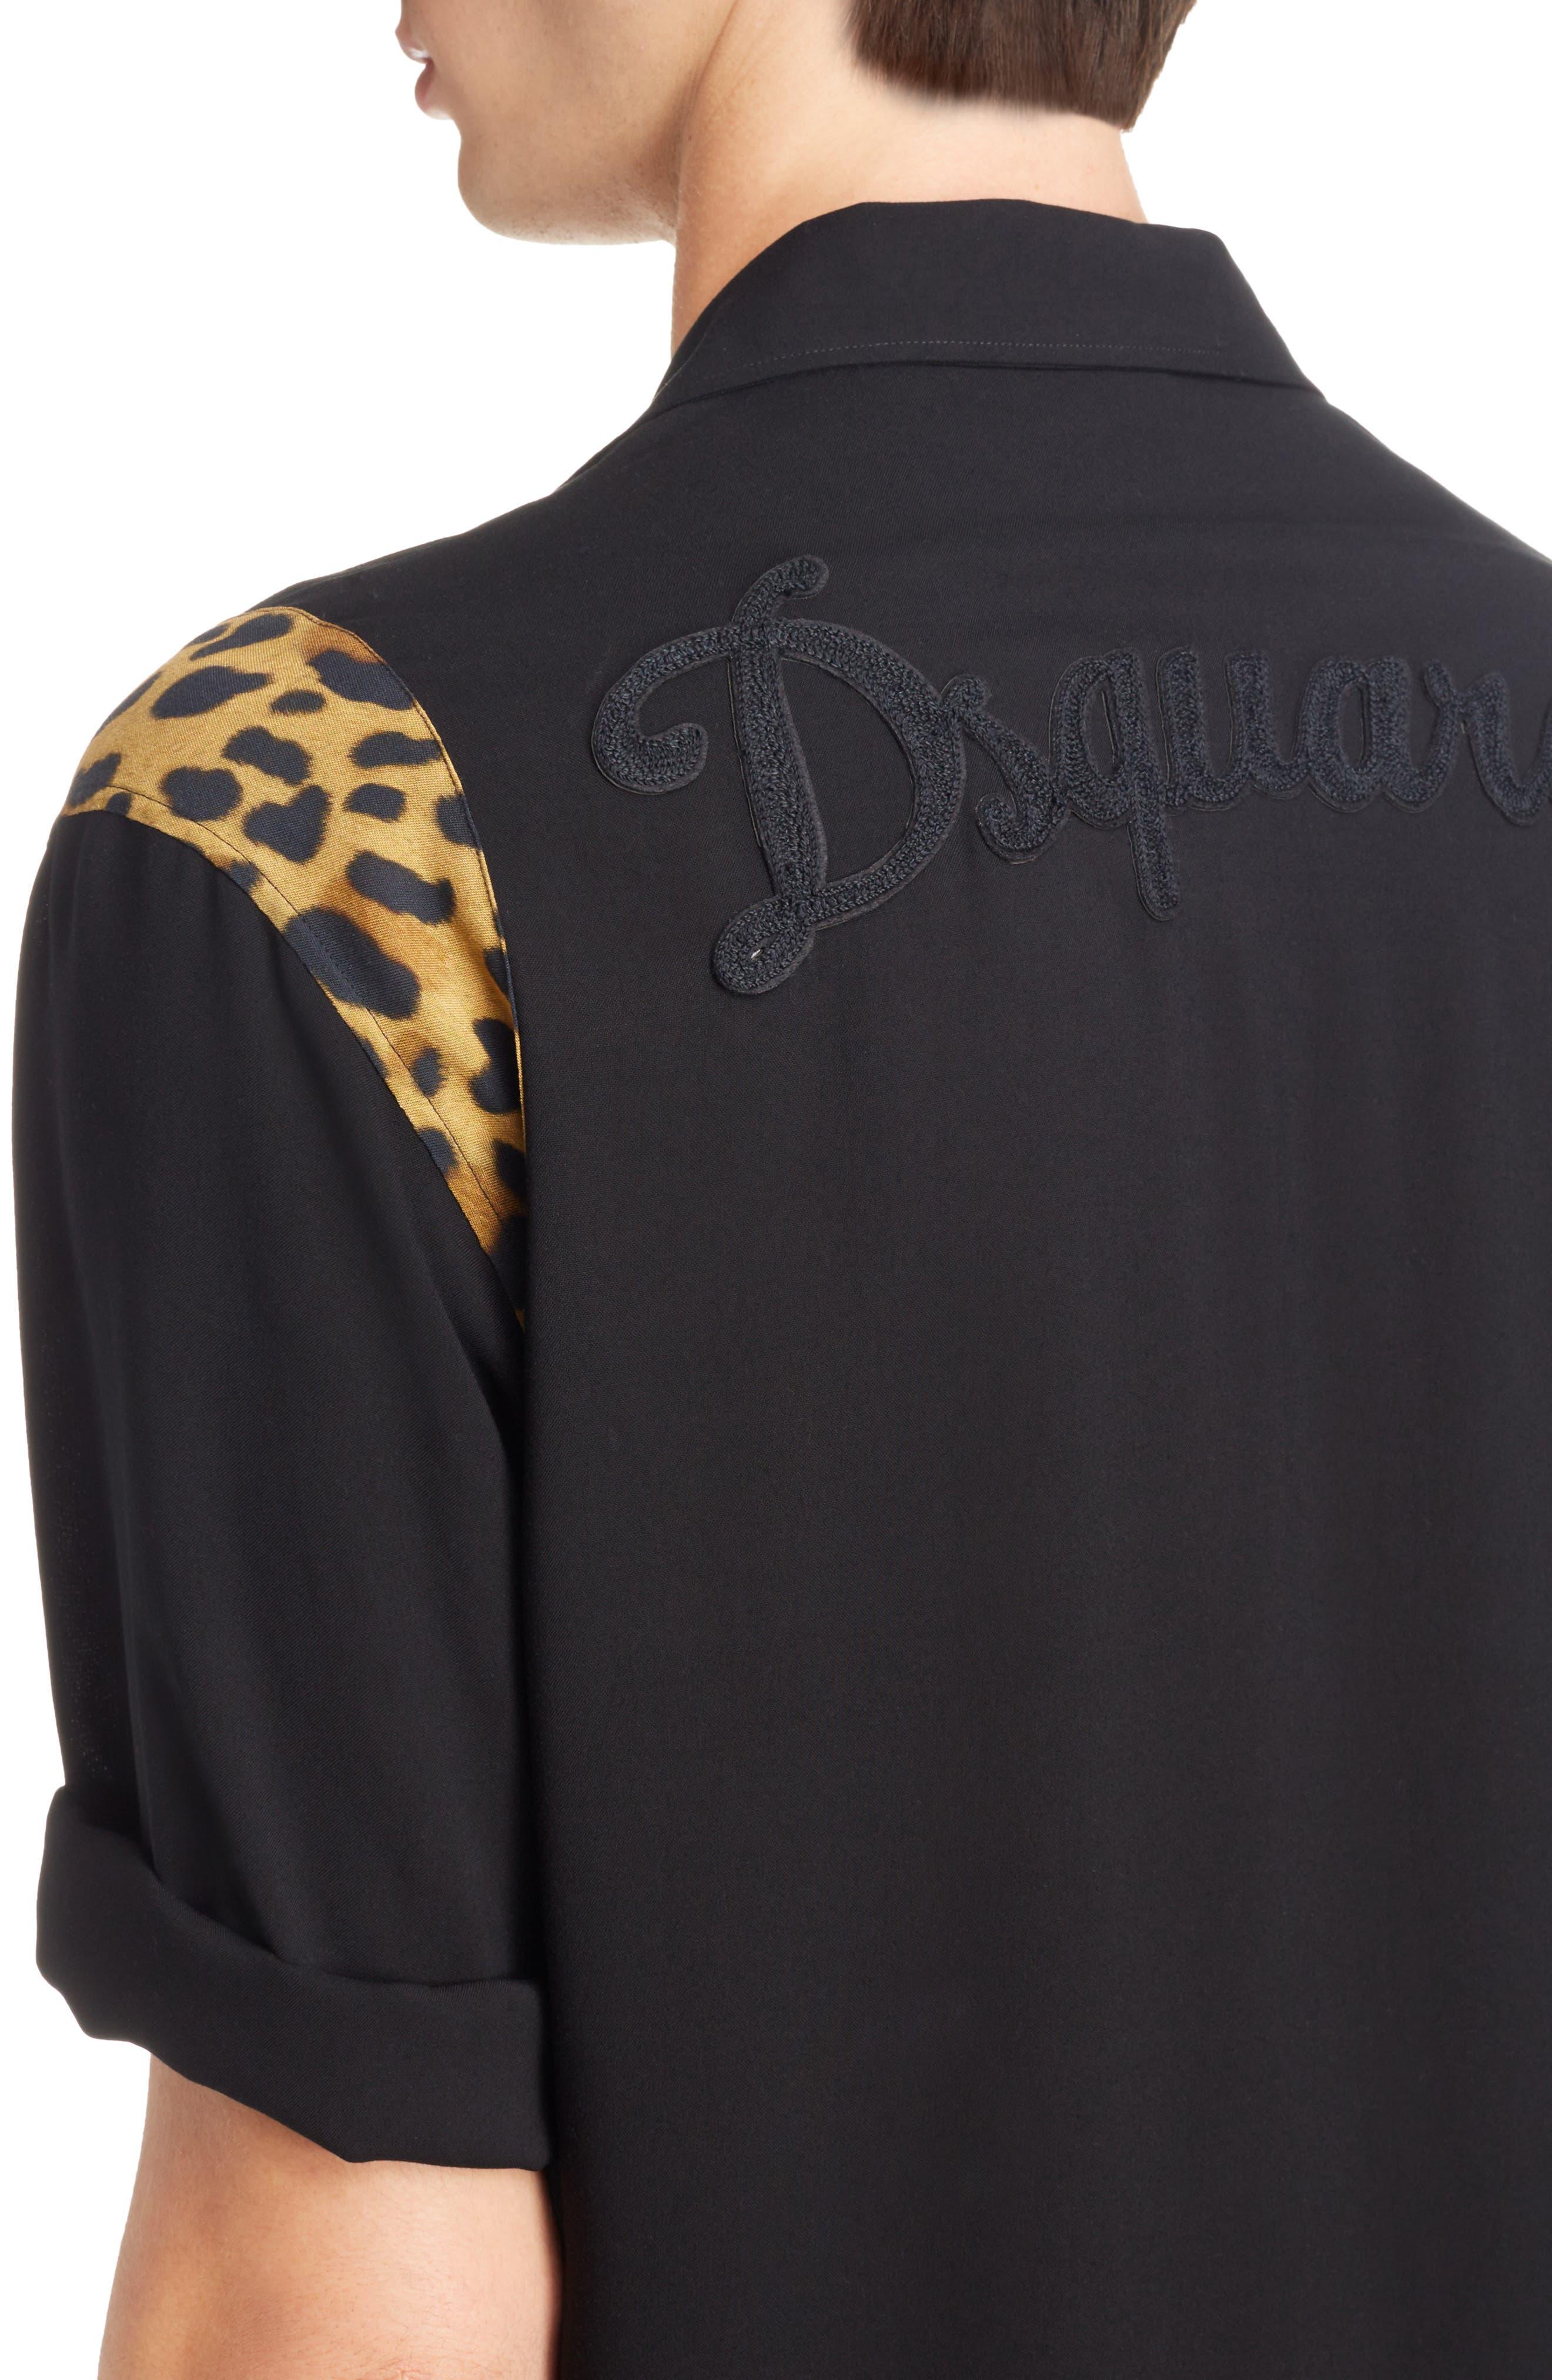 Bowling Shirt,                             Alternate thumbnail 2, color,                             Black